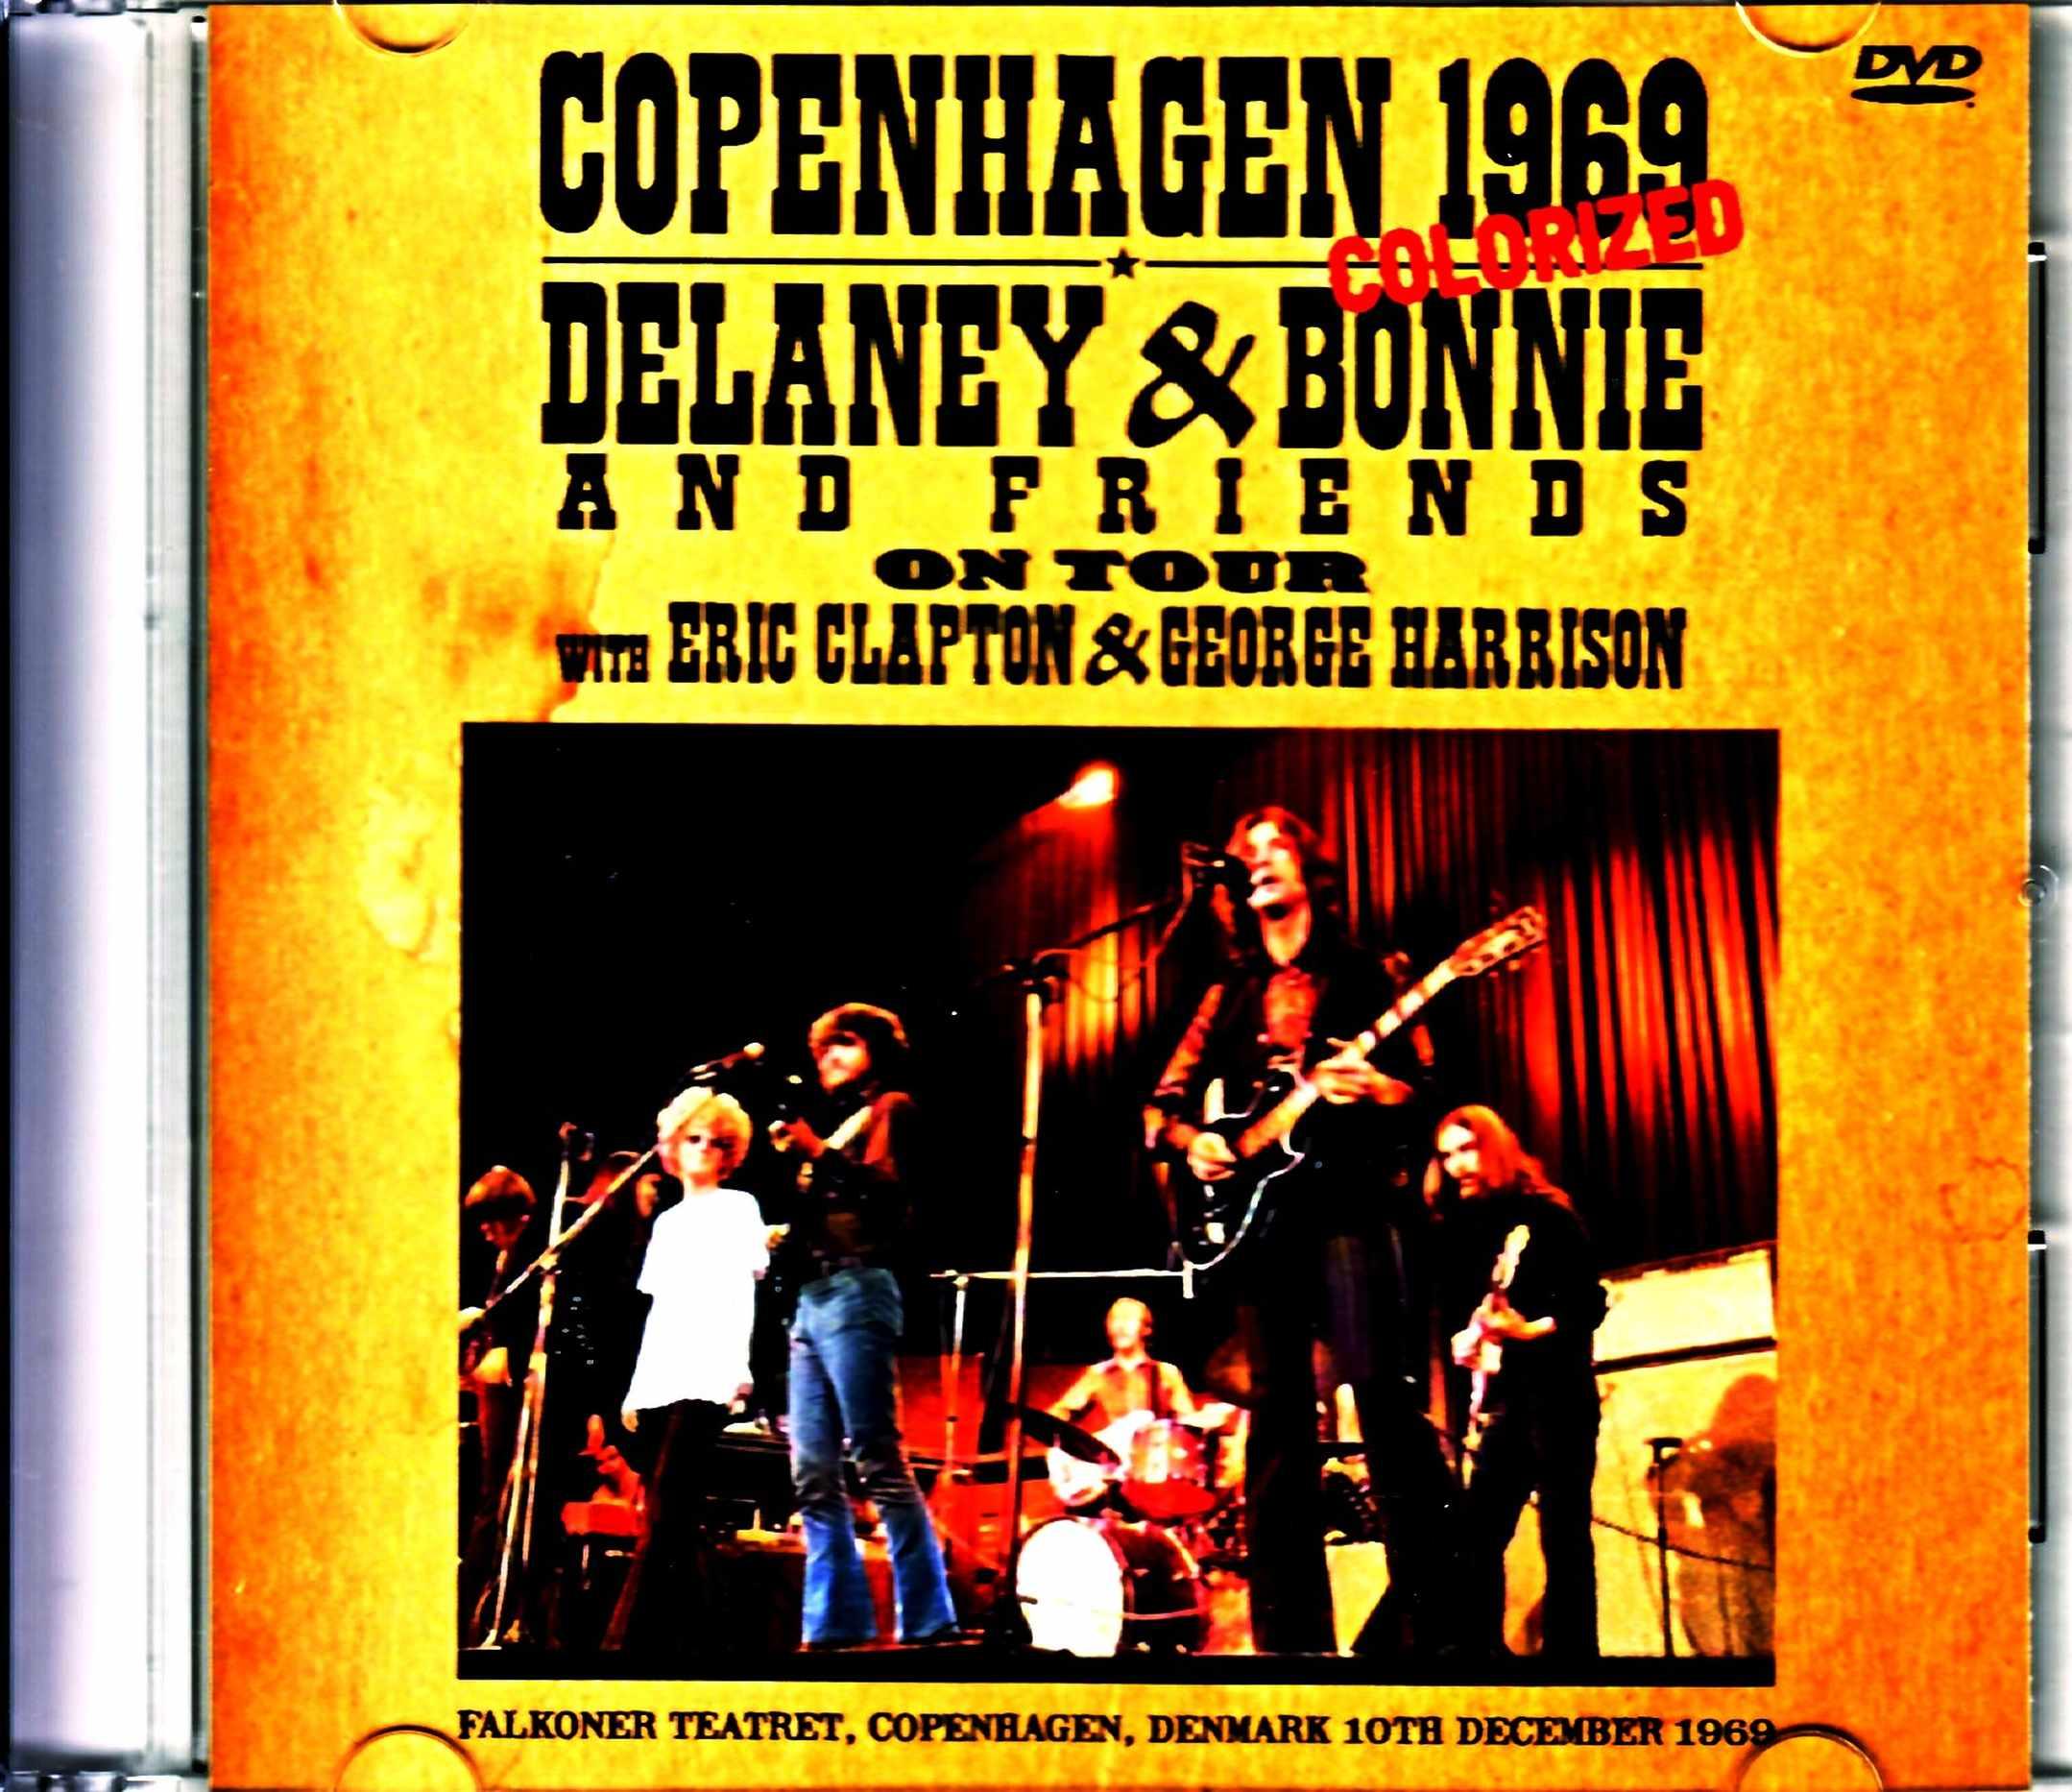 Delaney & Bonnie Eric Clapton,George Harrison デラニー・アンド・ボニー/Denmark 1969 Full Color Version